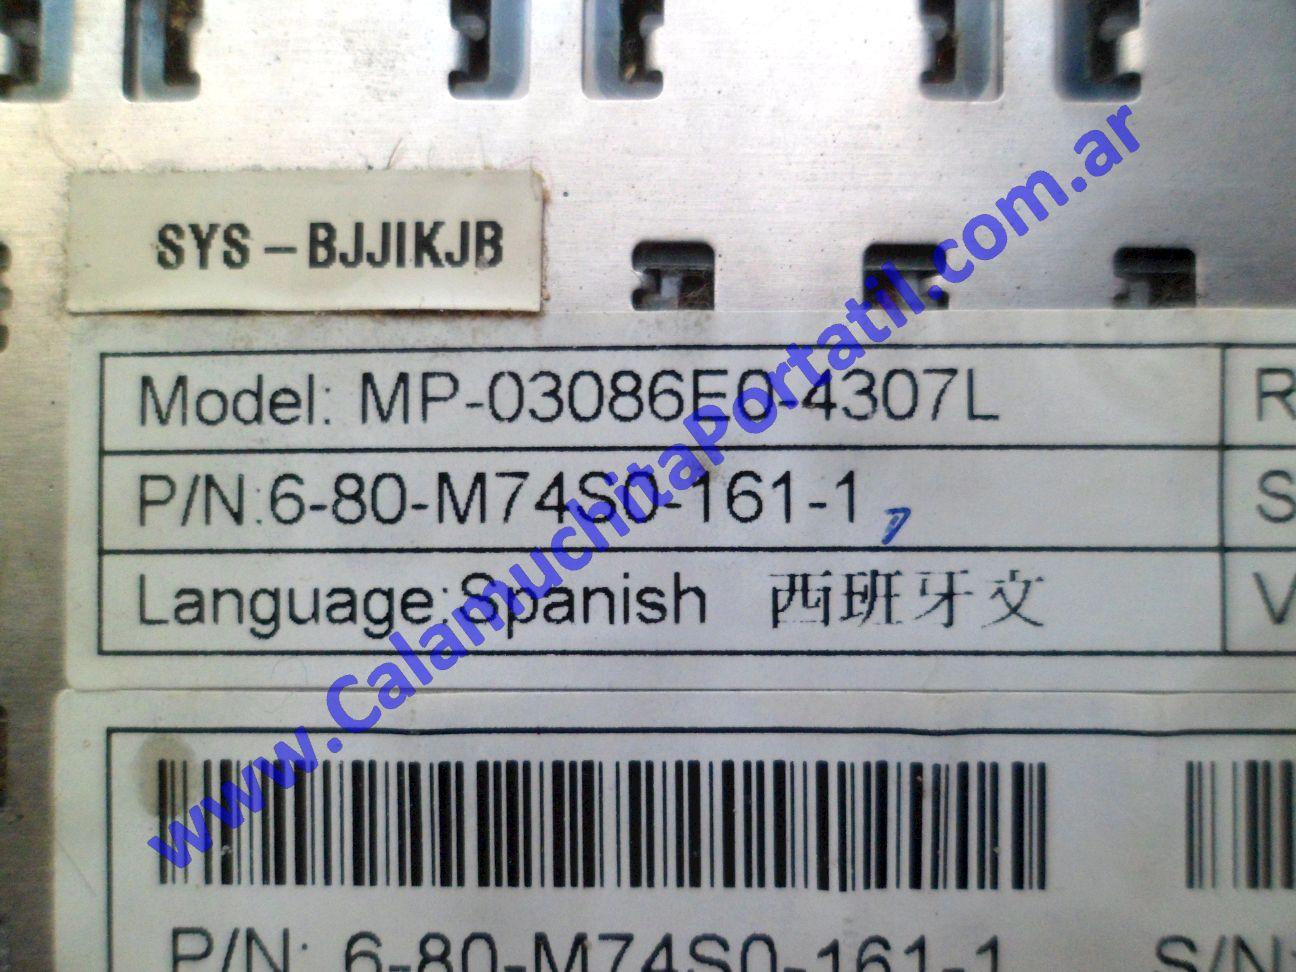 0610KBA Teclado Banghó B-74X0S